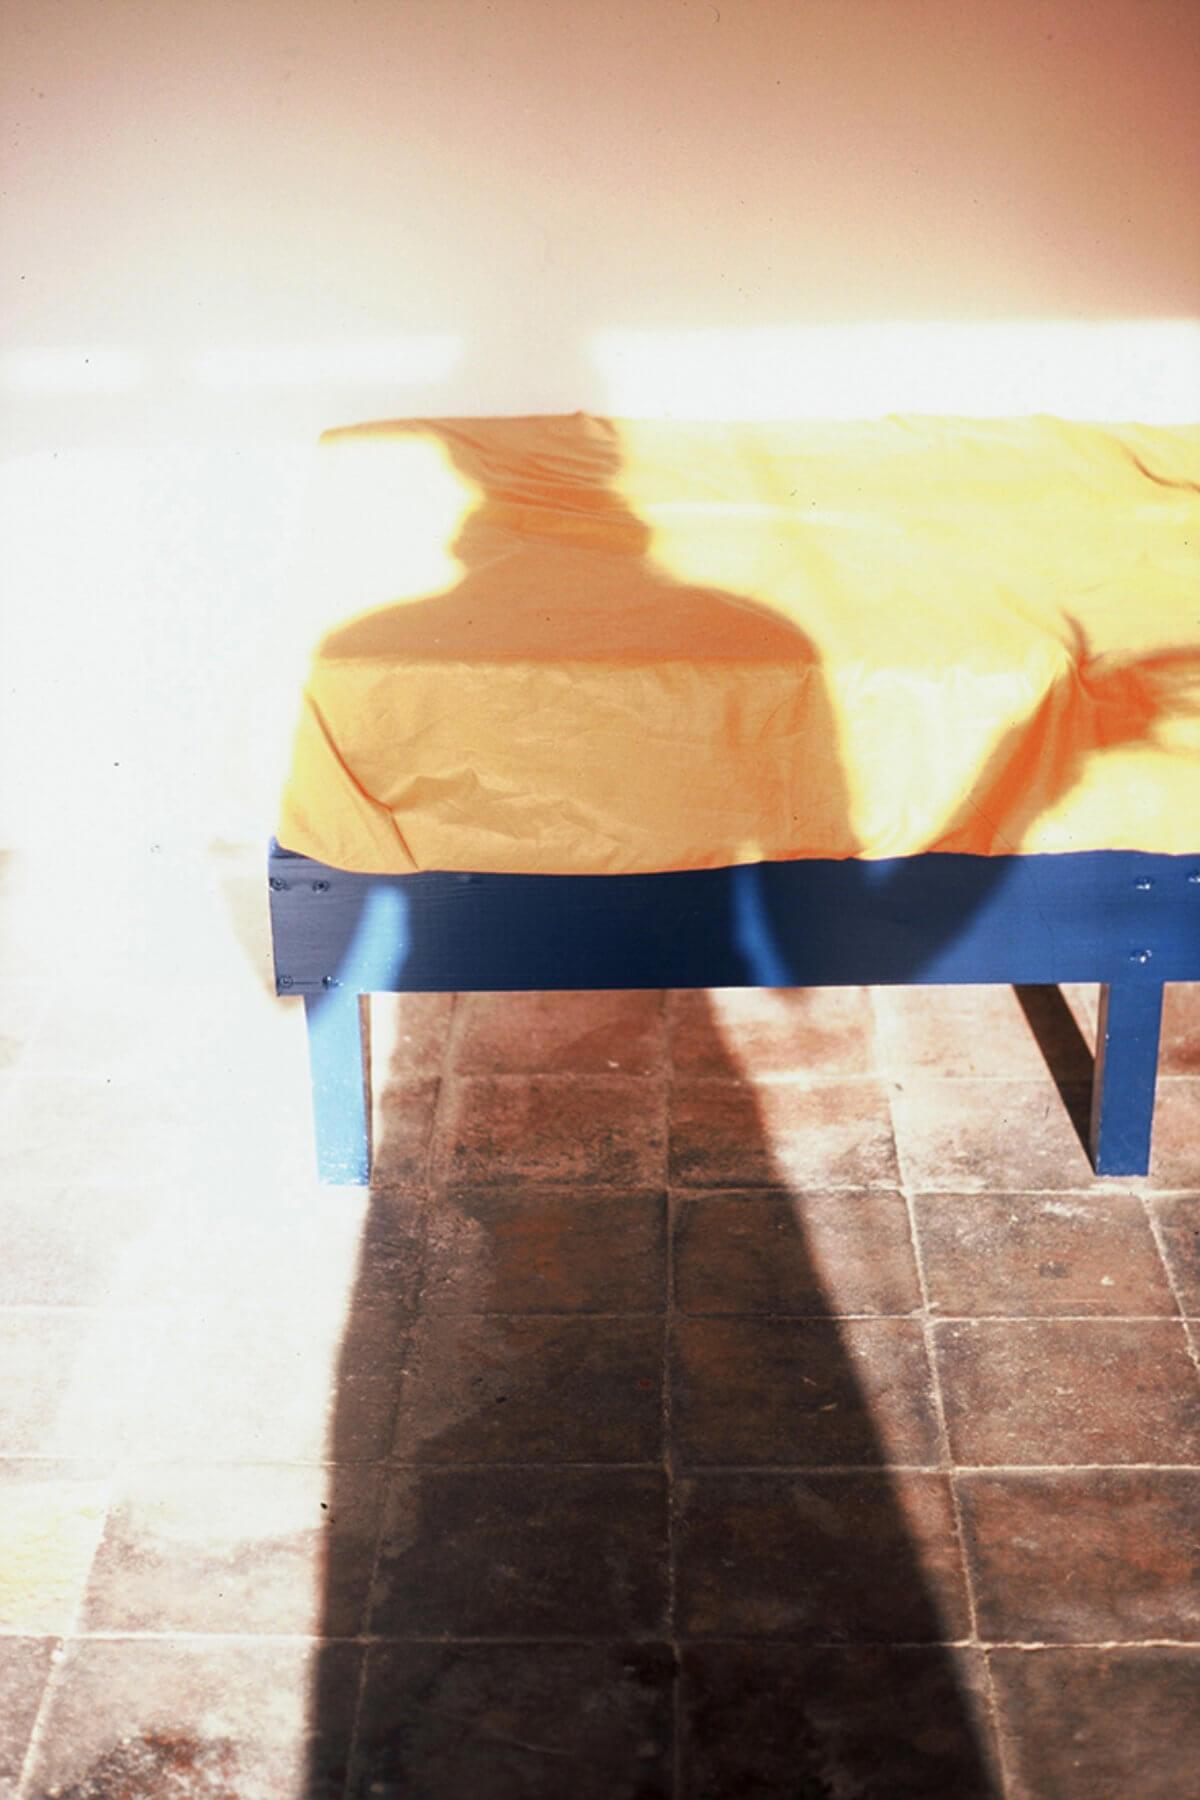 untitled(leg tiles), photography, 2004